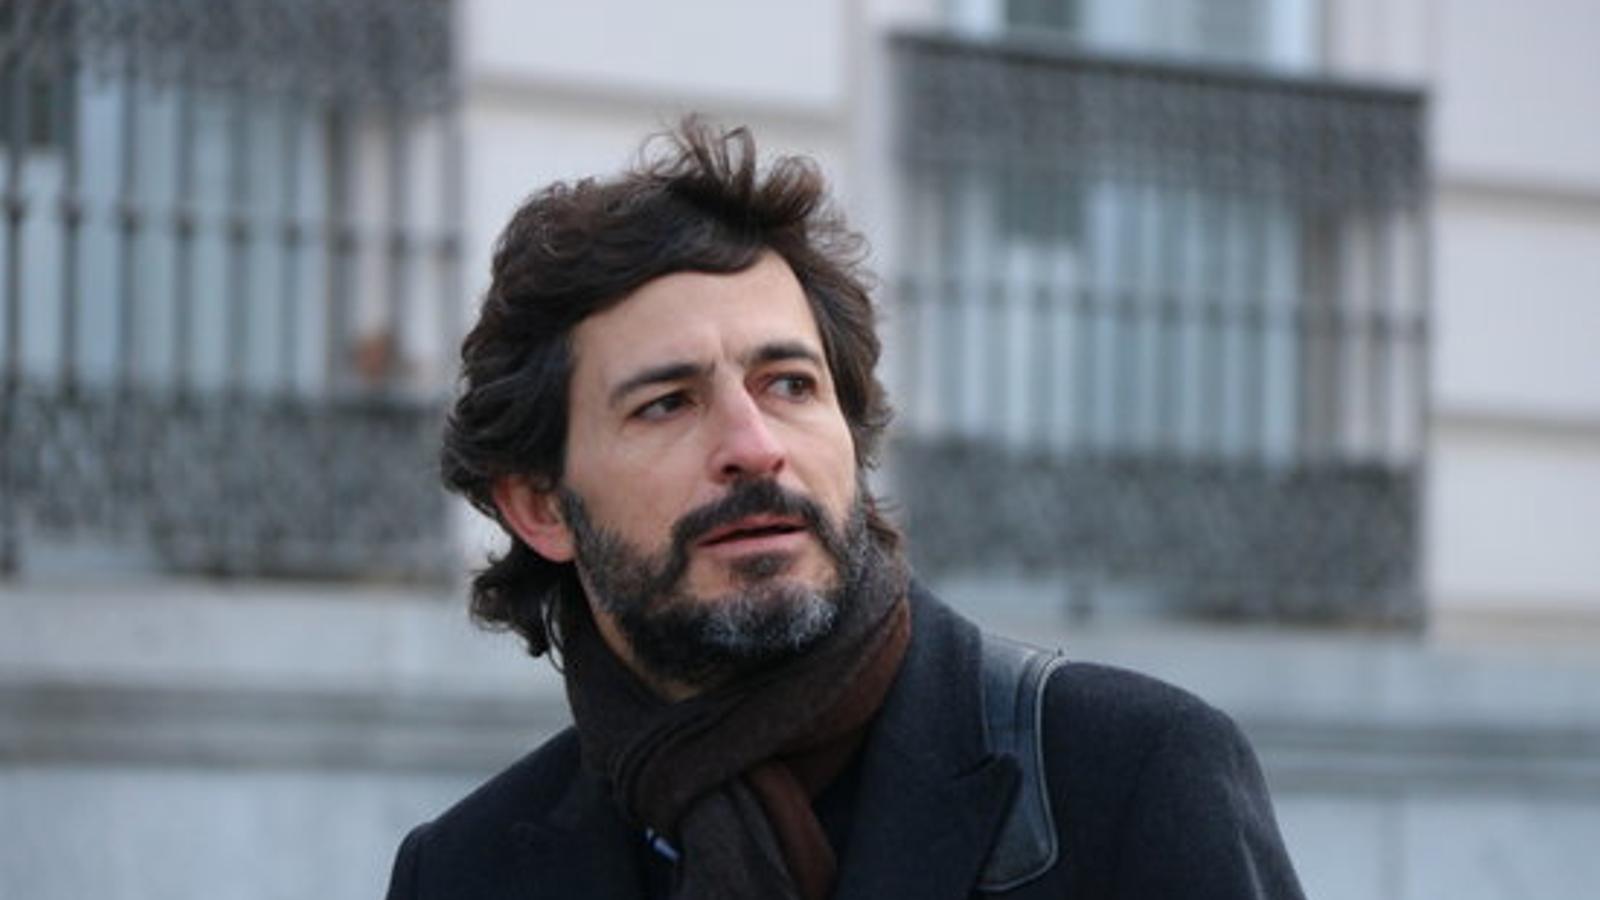 Oleguer Pujol arriba a l'Audiència Nacional / ACN